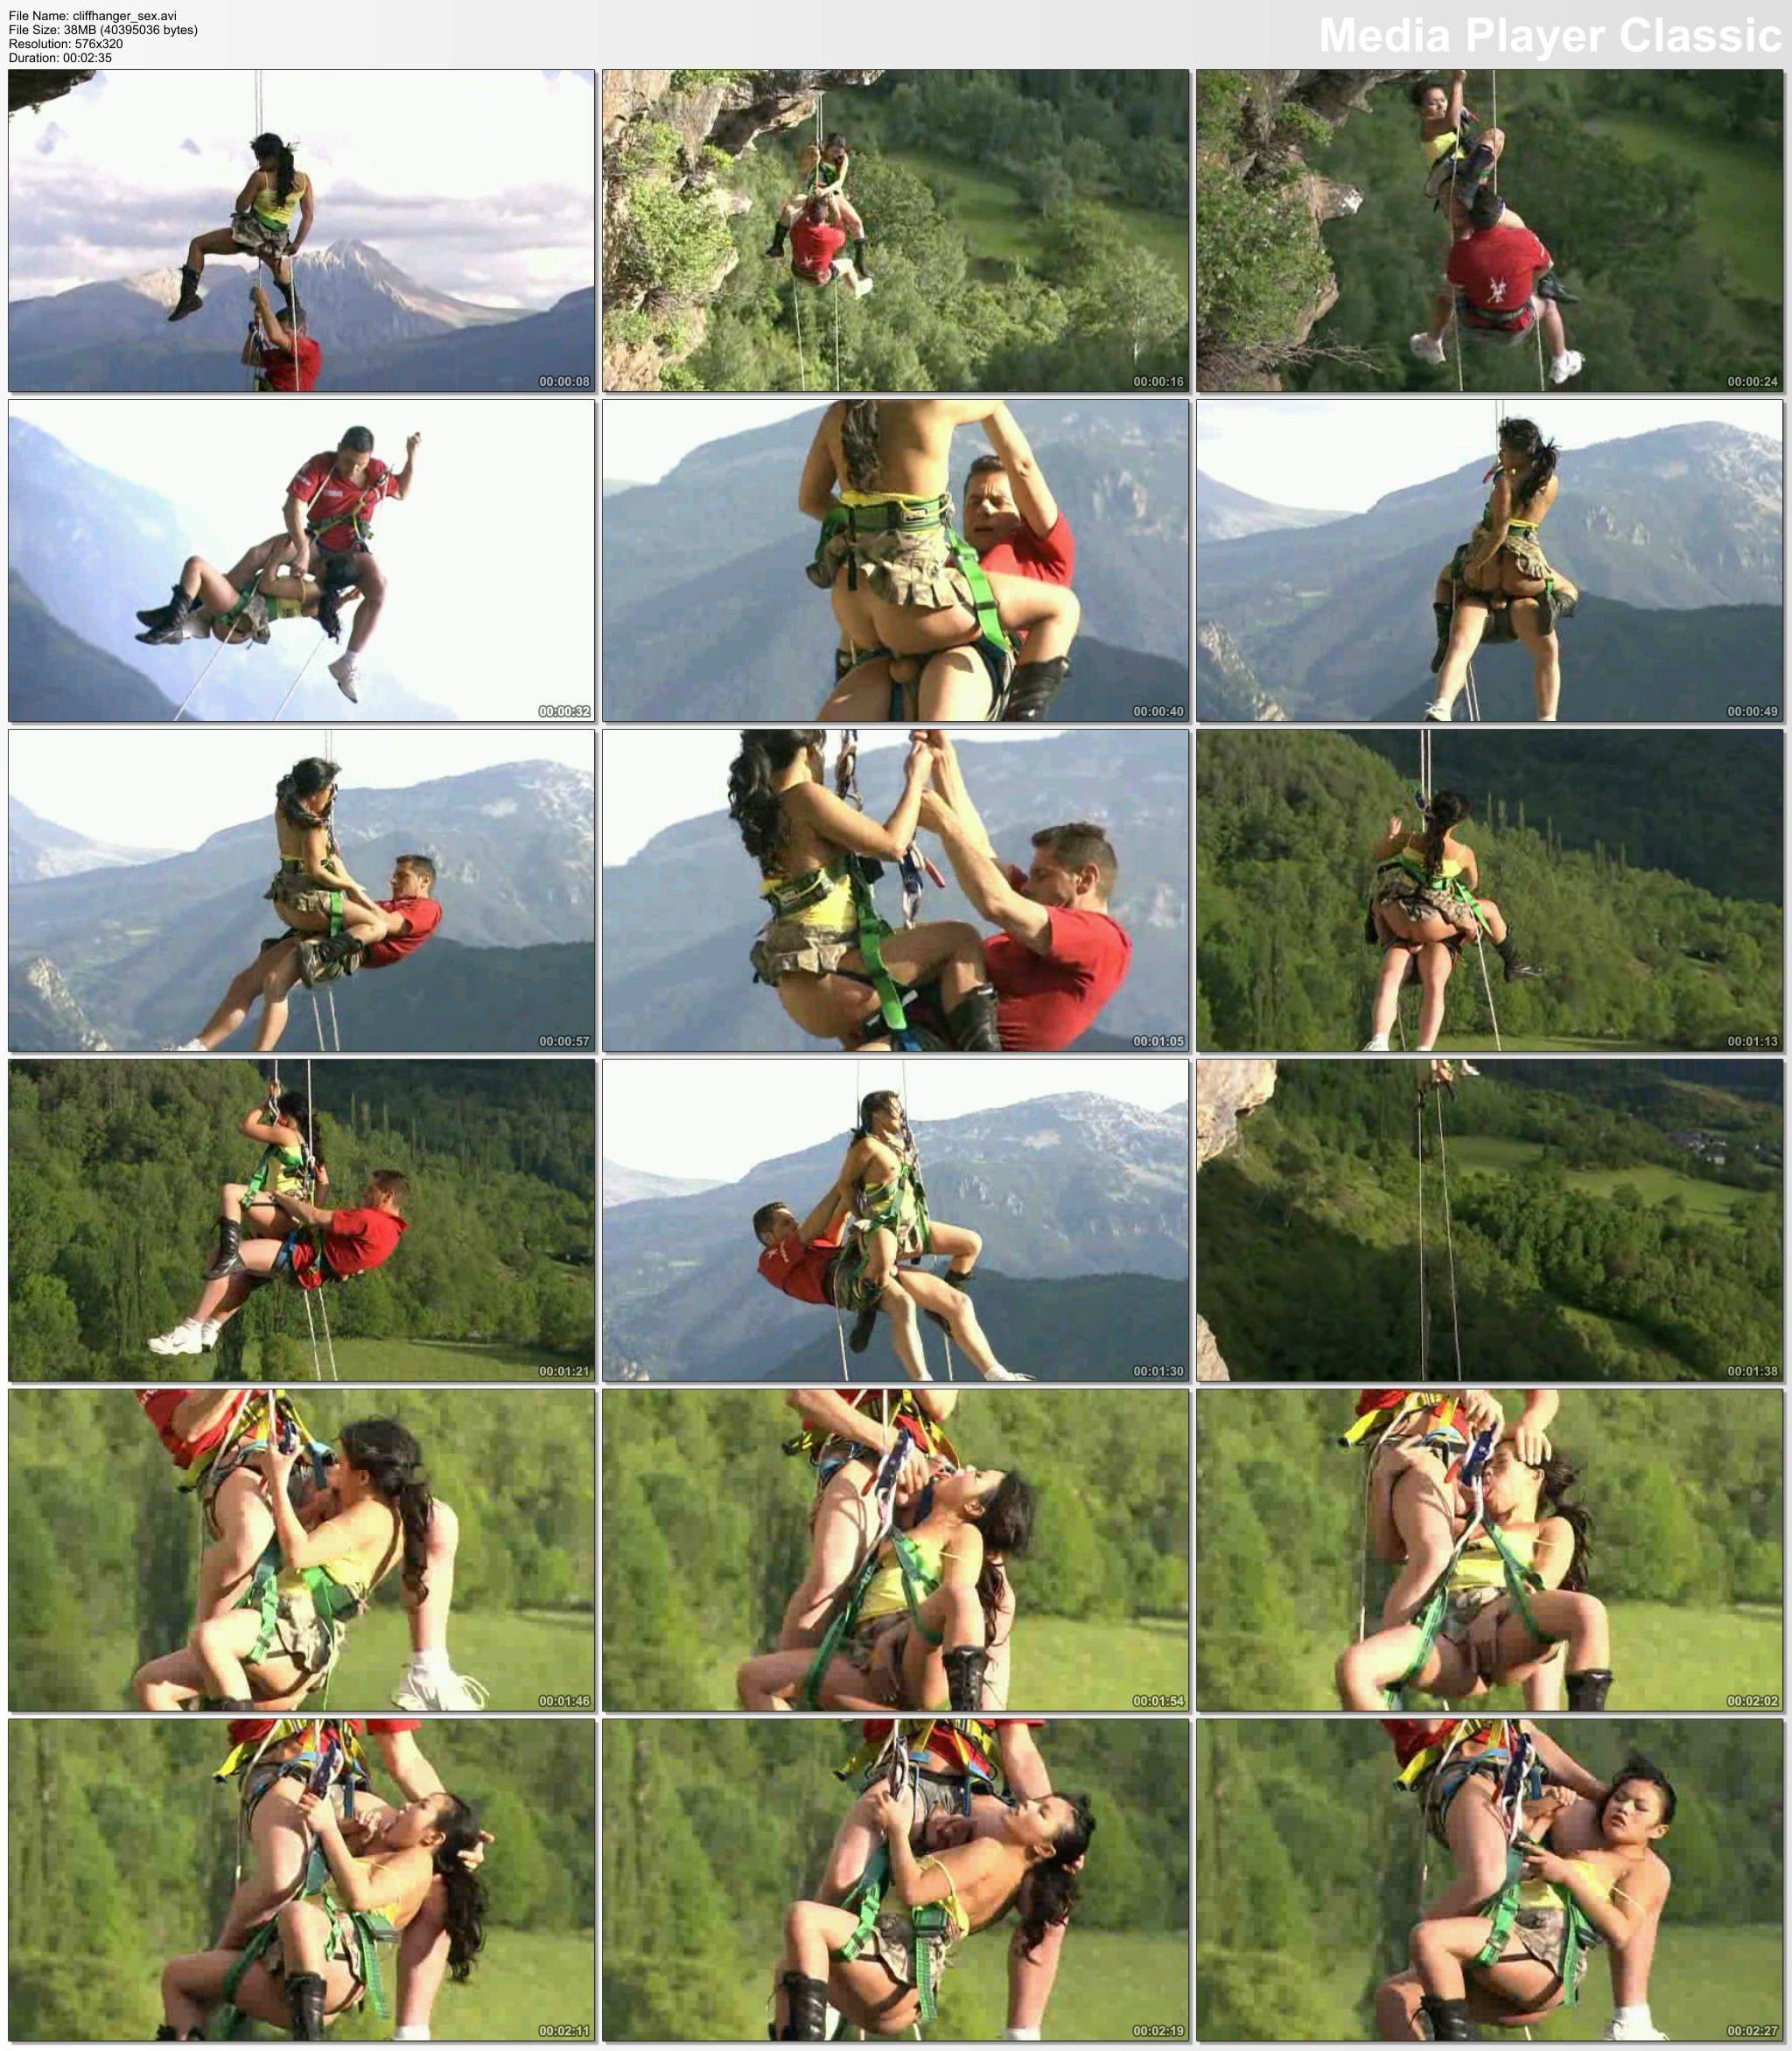 Chopper reccomend climbing fuck rock